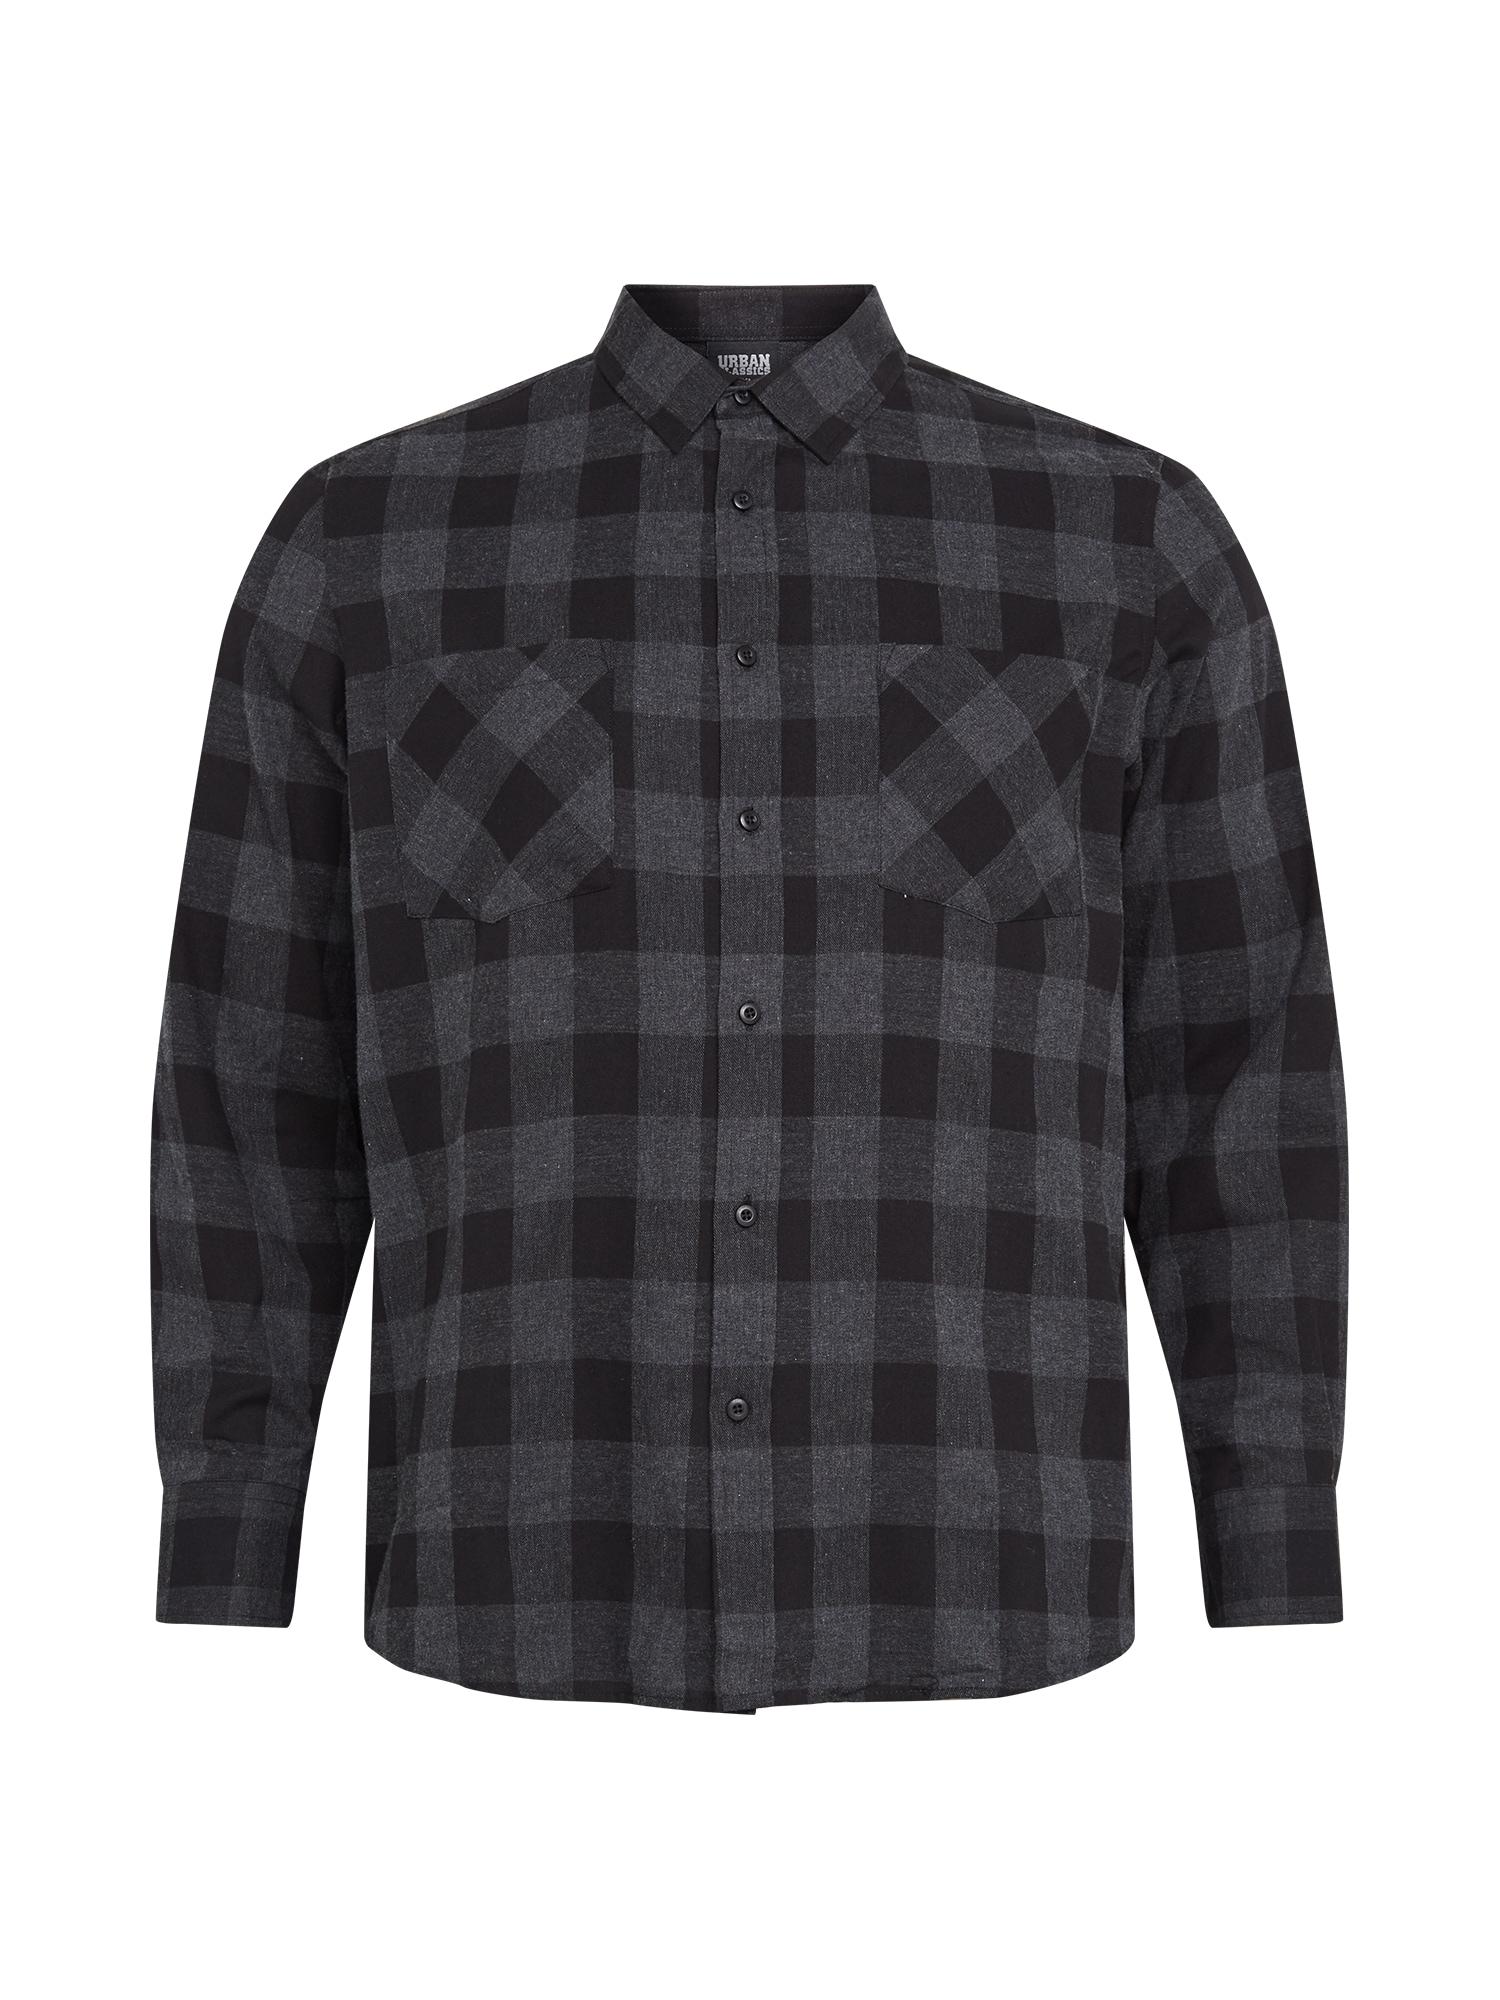 Urban Classics Big & Tall Marškiniai pilka / juoda